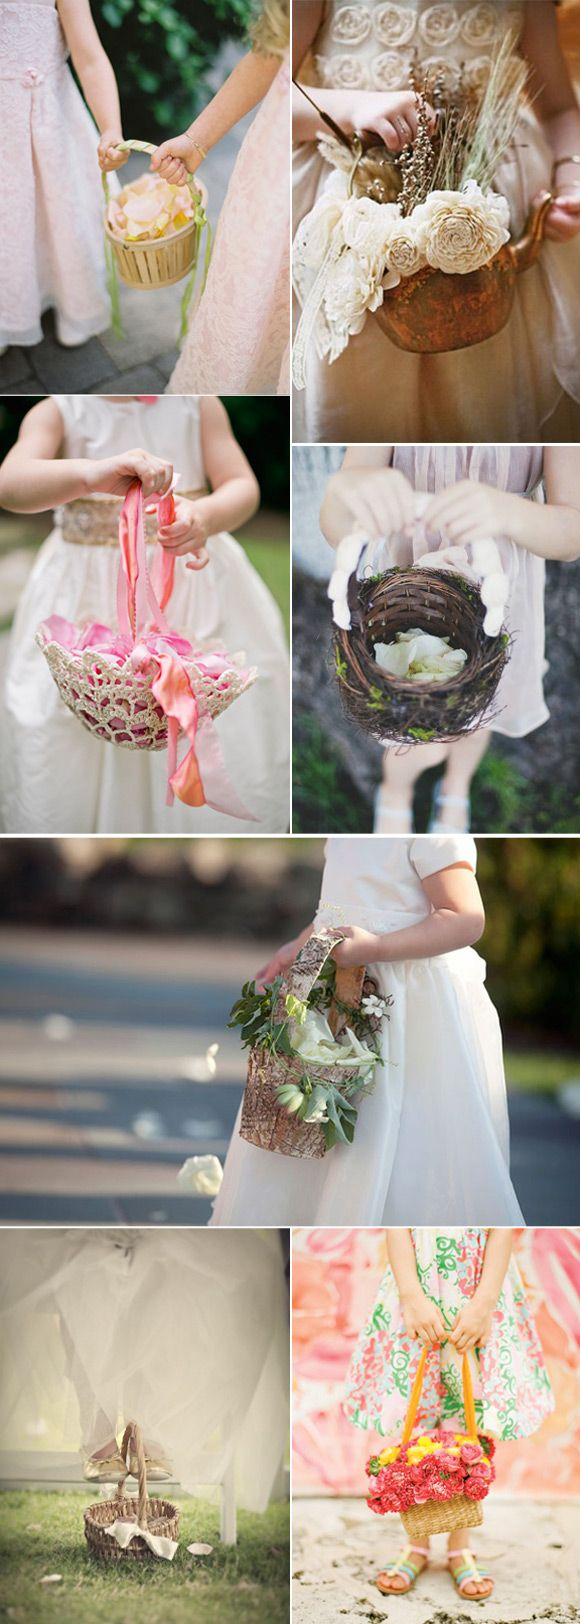 47 best images about decoracion iglesias boda on pinterest for Ideas para decorar una boda